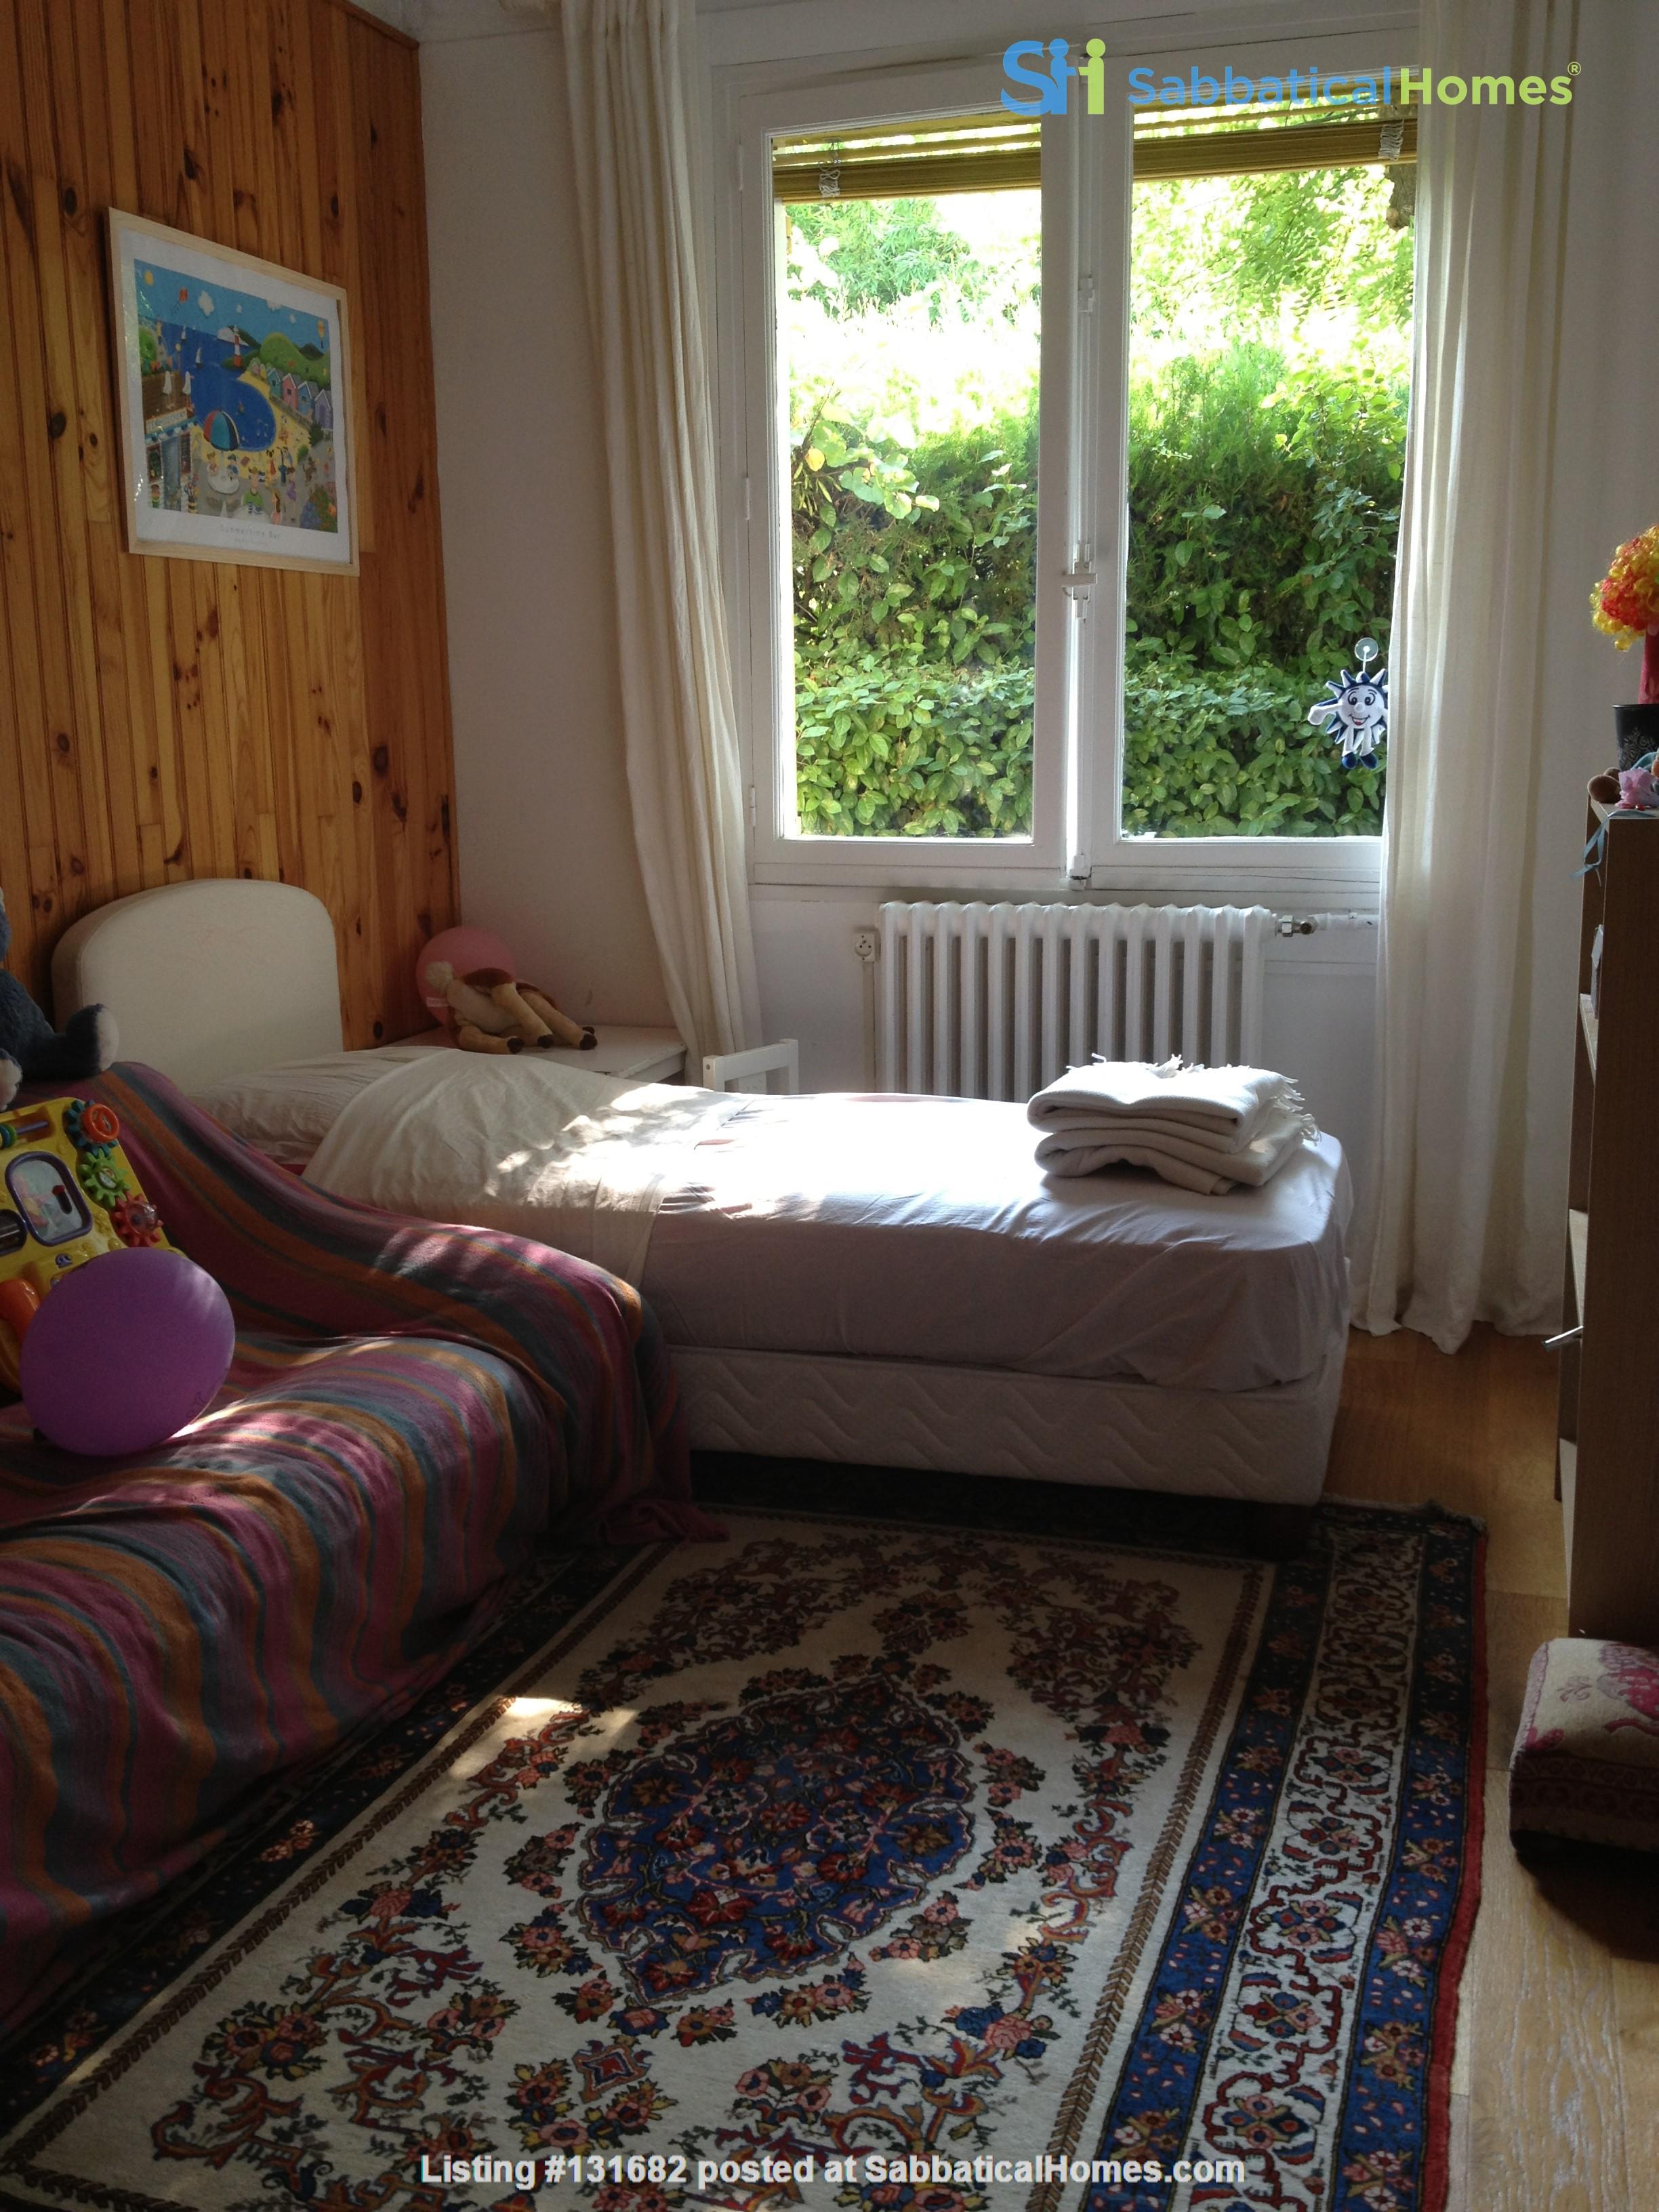 Full Family House in Montpellier Home Rental in Montpellier, Occitanie, France 9